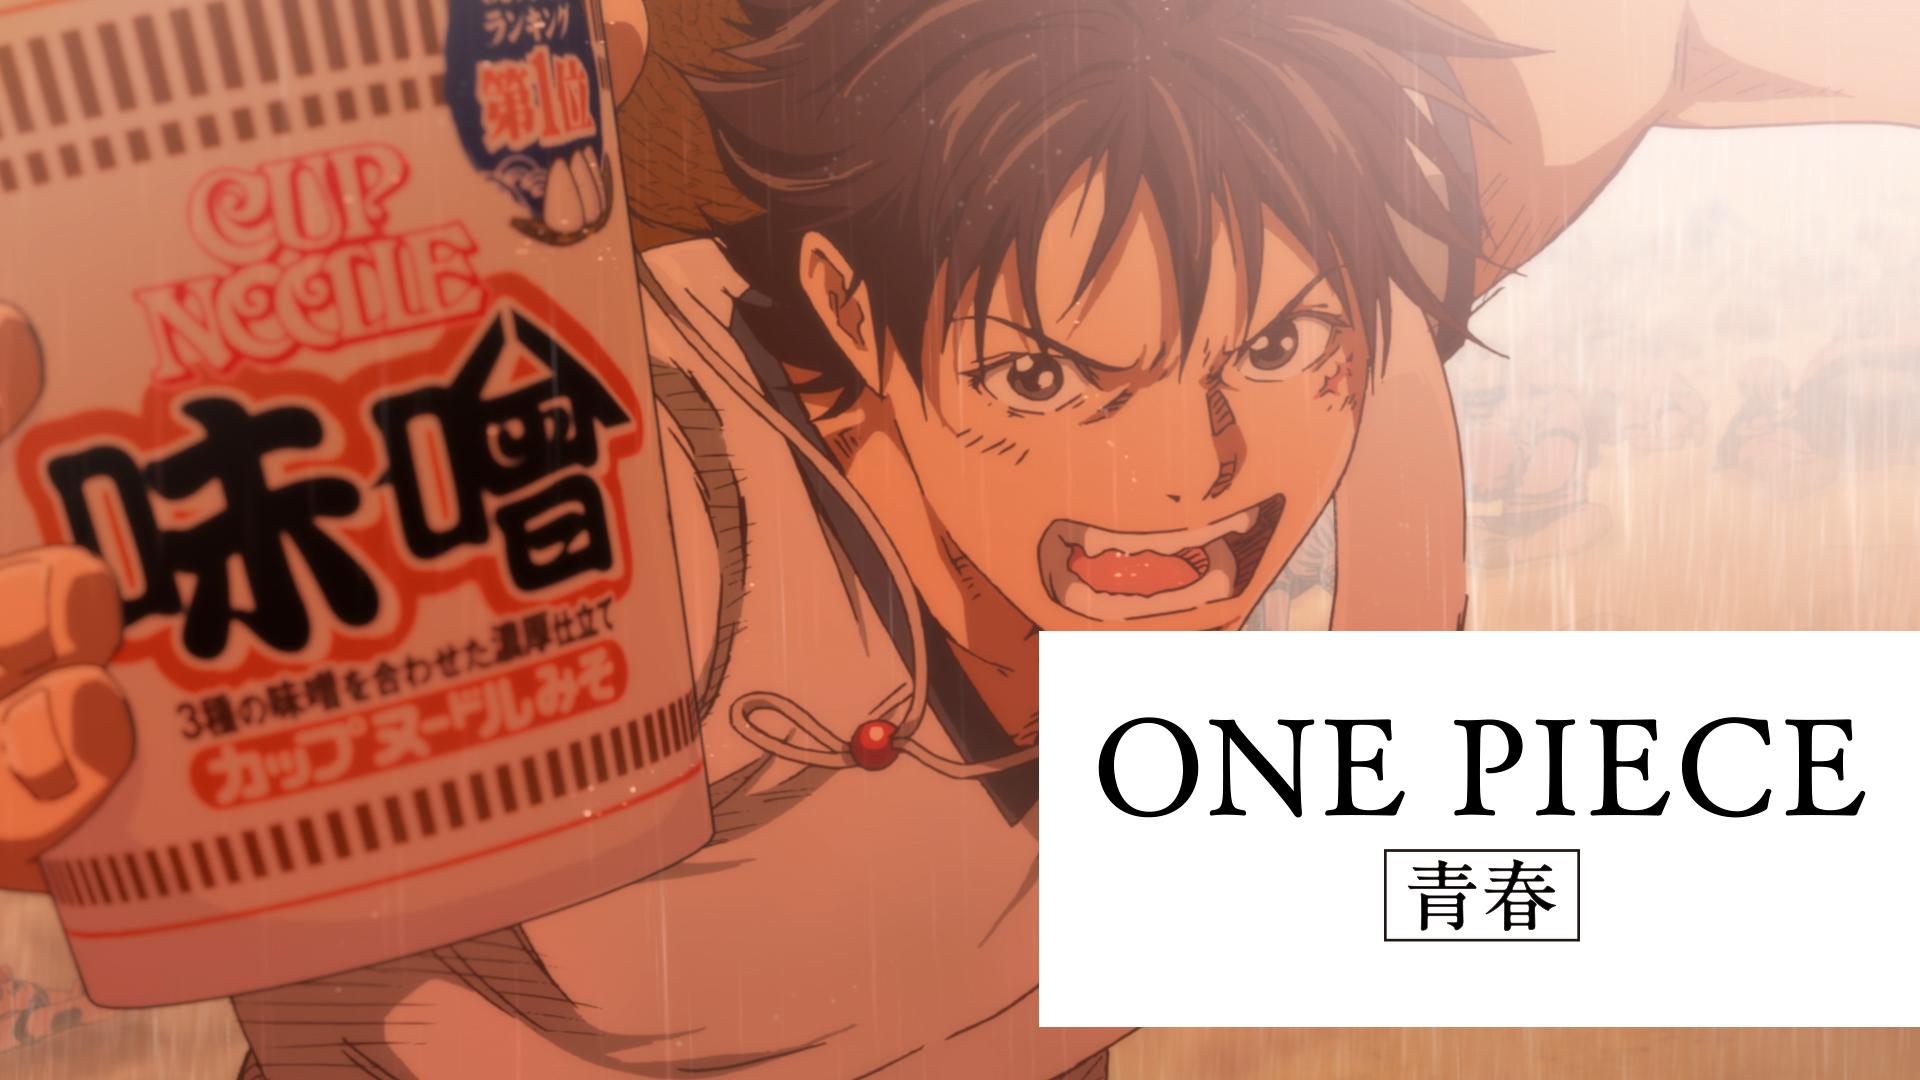 One Piece チョッパー と老舗テディベアブランド シュタイフがコラボ